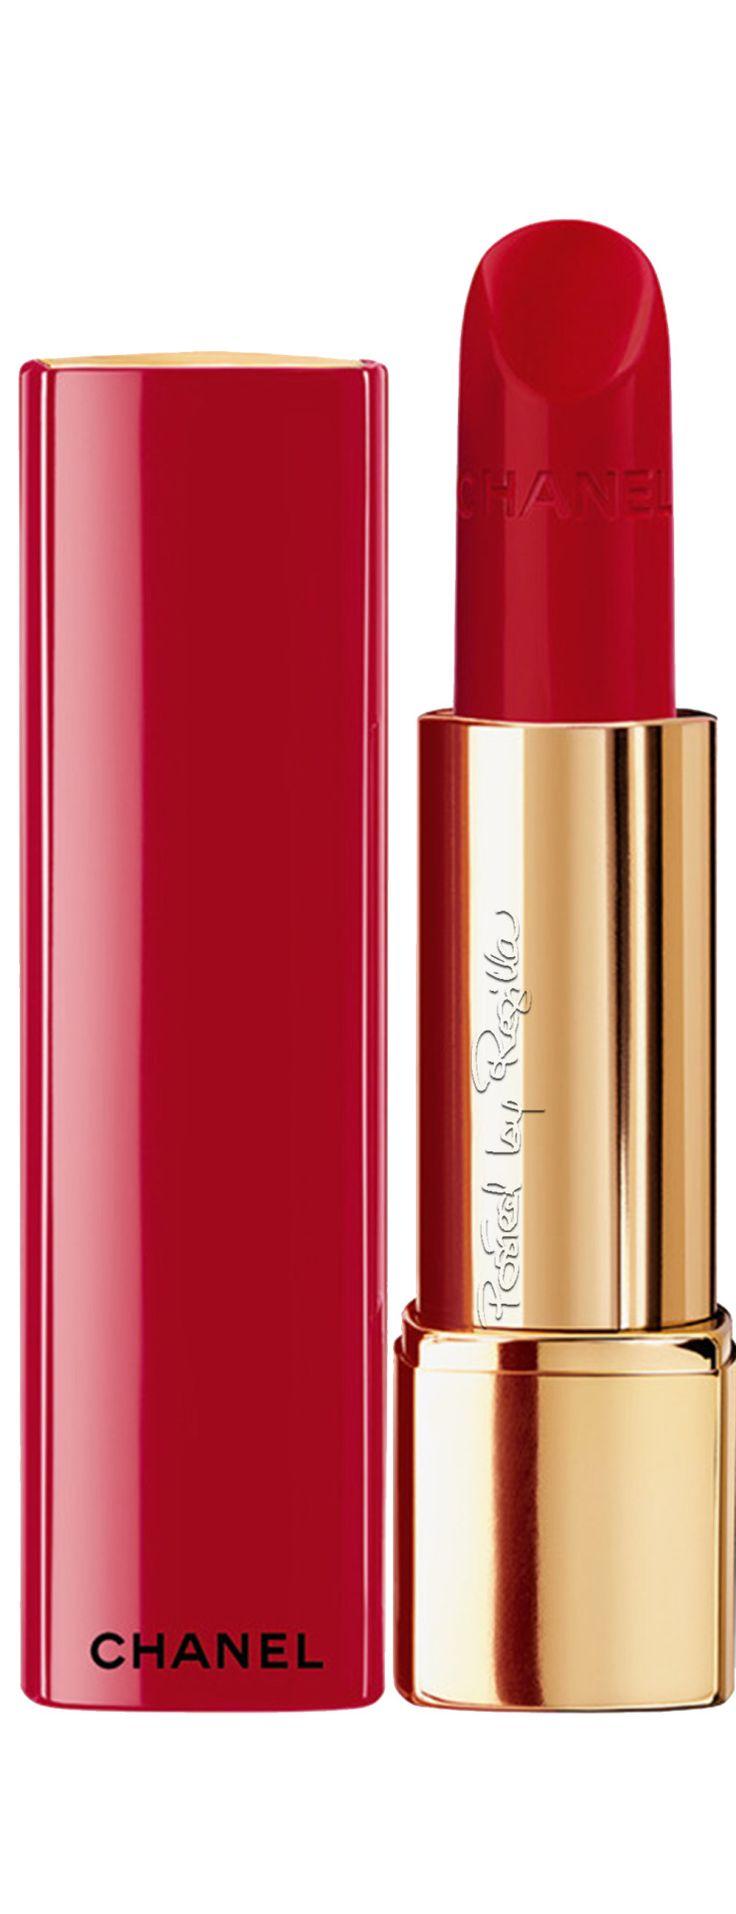 1556 Best Beauty Images On Pinterest Lipstick Lipsticks And Jill Lip Matte 01 Red Cherry Chanel Boutiqueholiday Fashionred Lipsrevolutionwomens